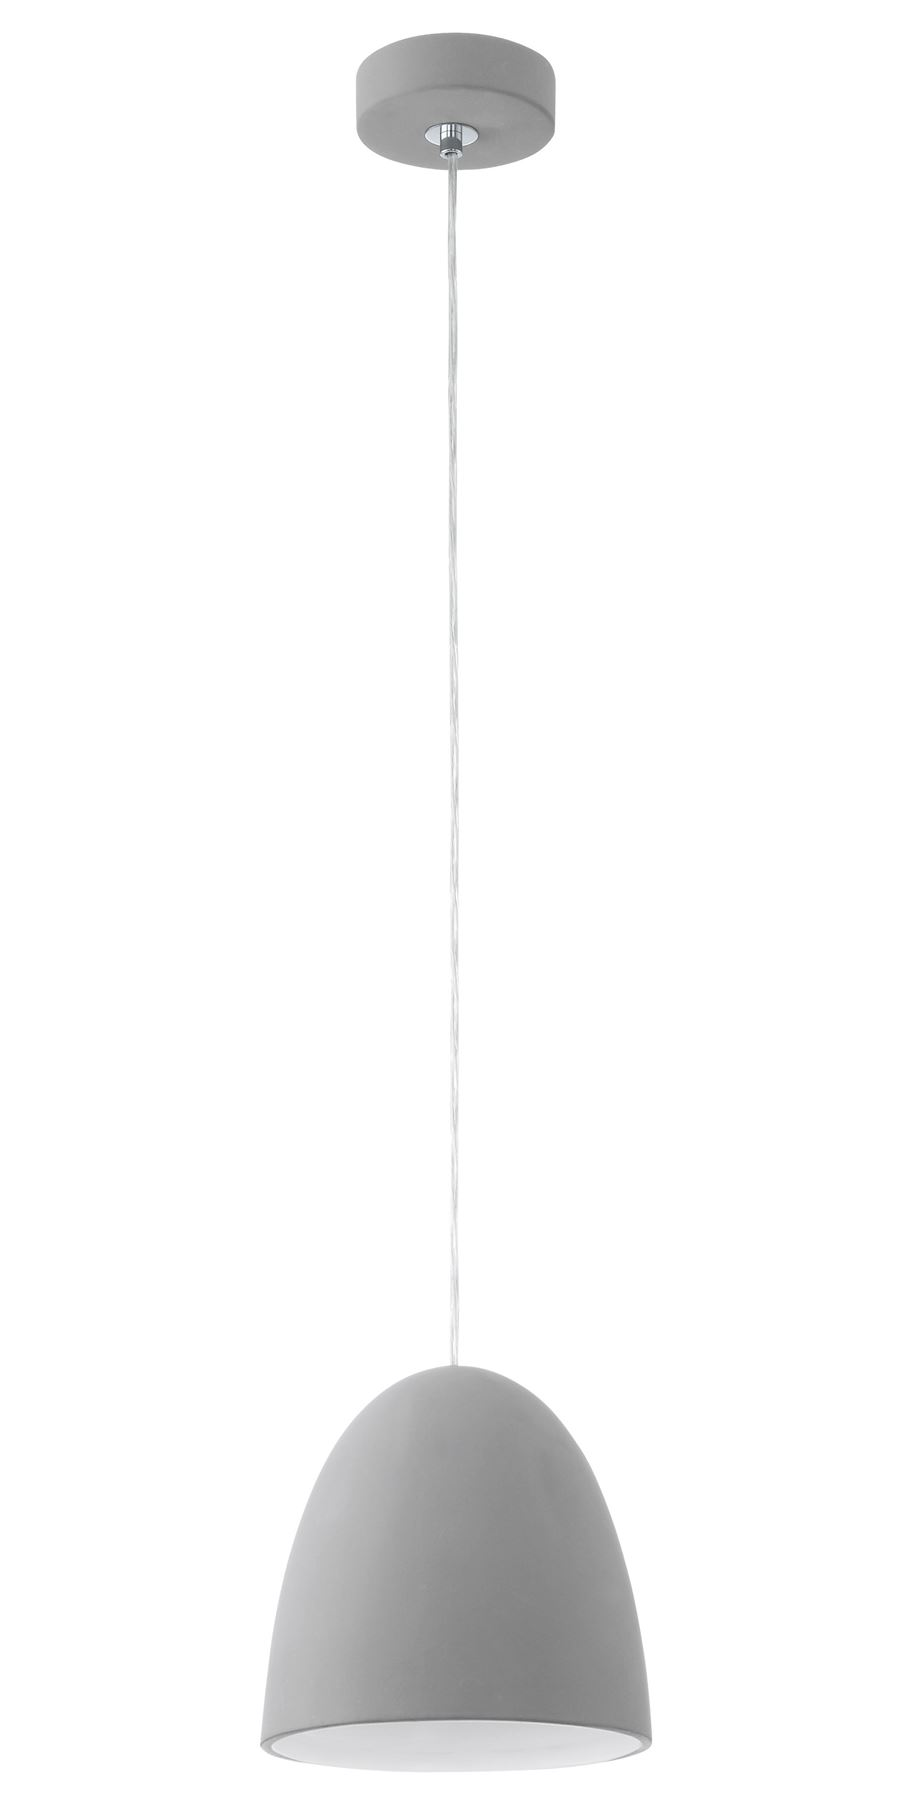 Pratella Modern Pendant 1 Hanging Light E27 Ceramic Grey